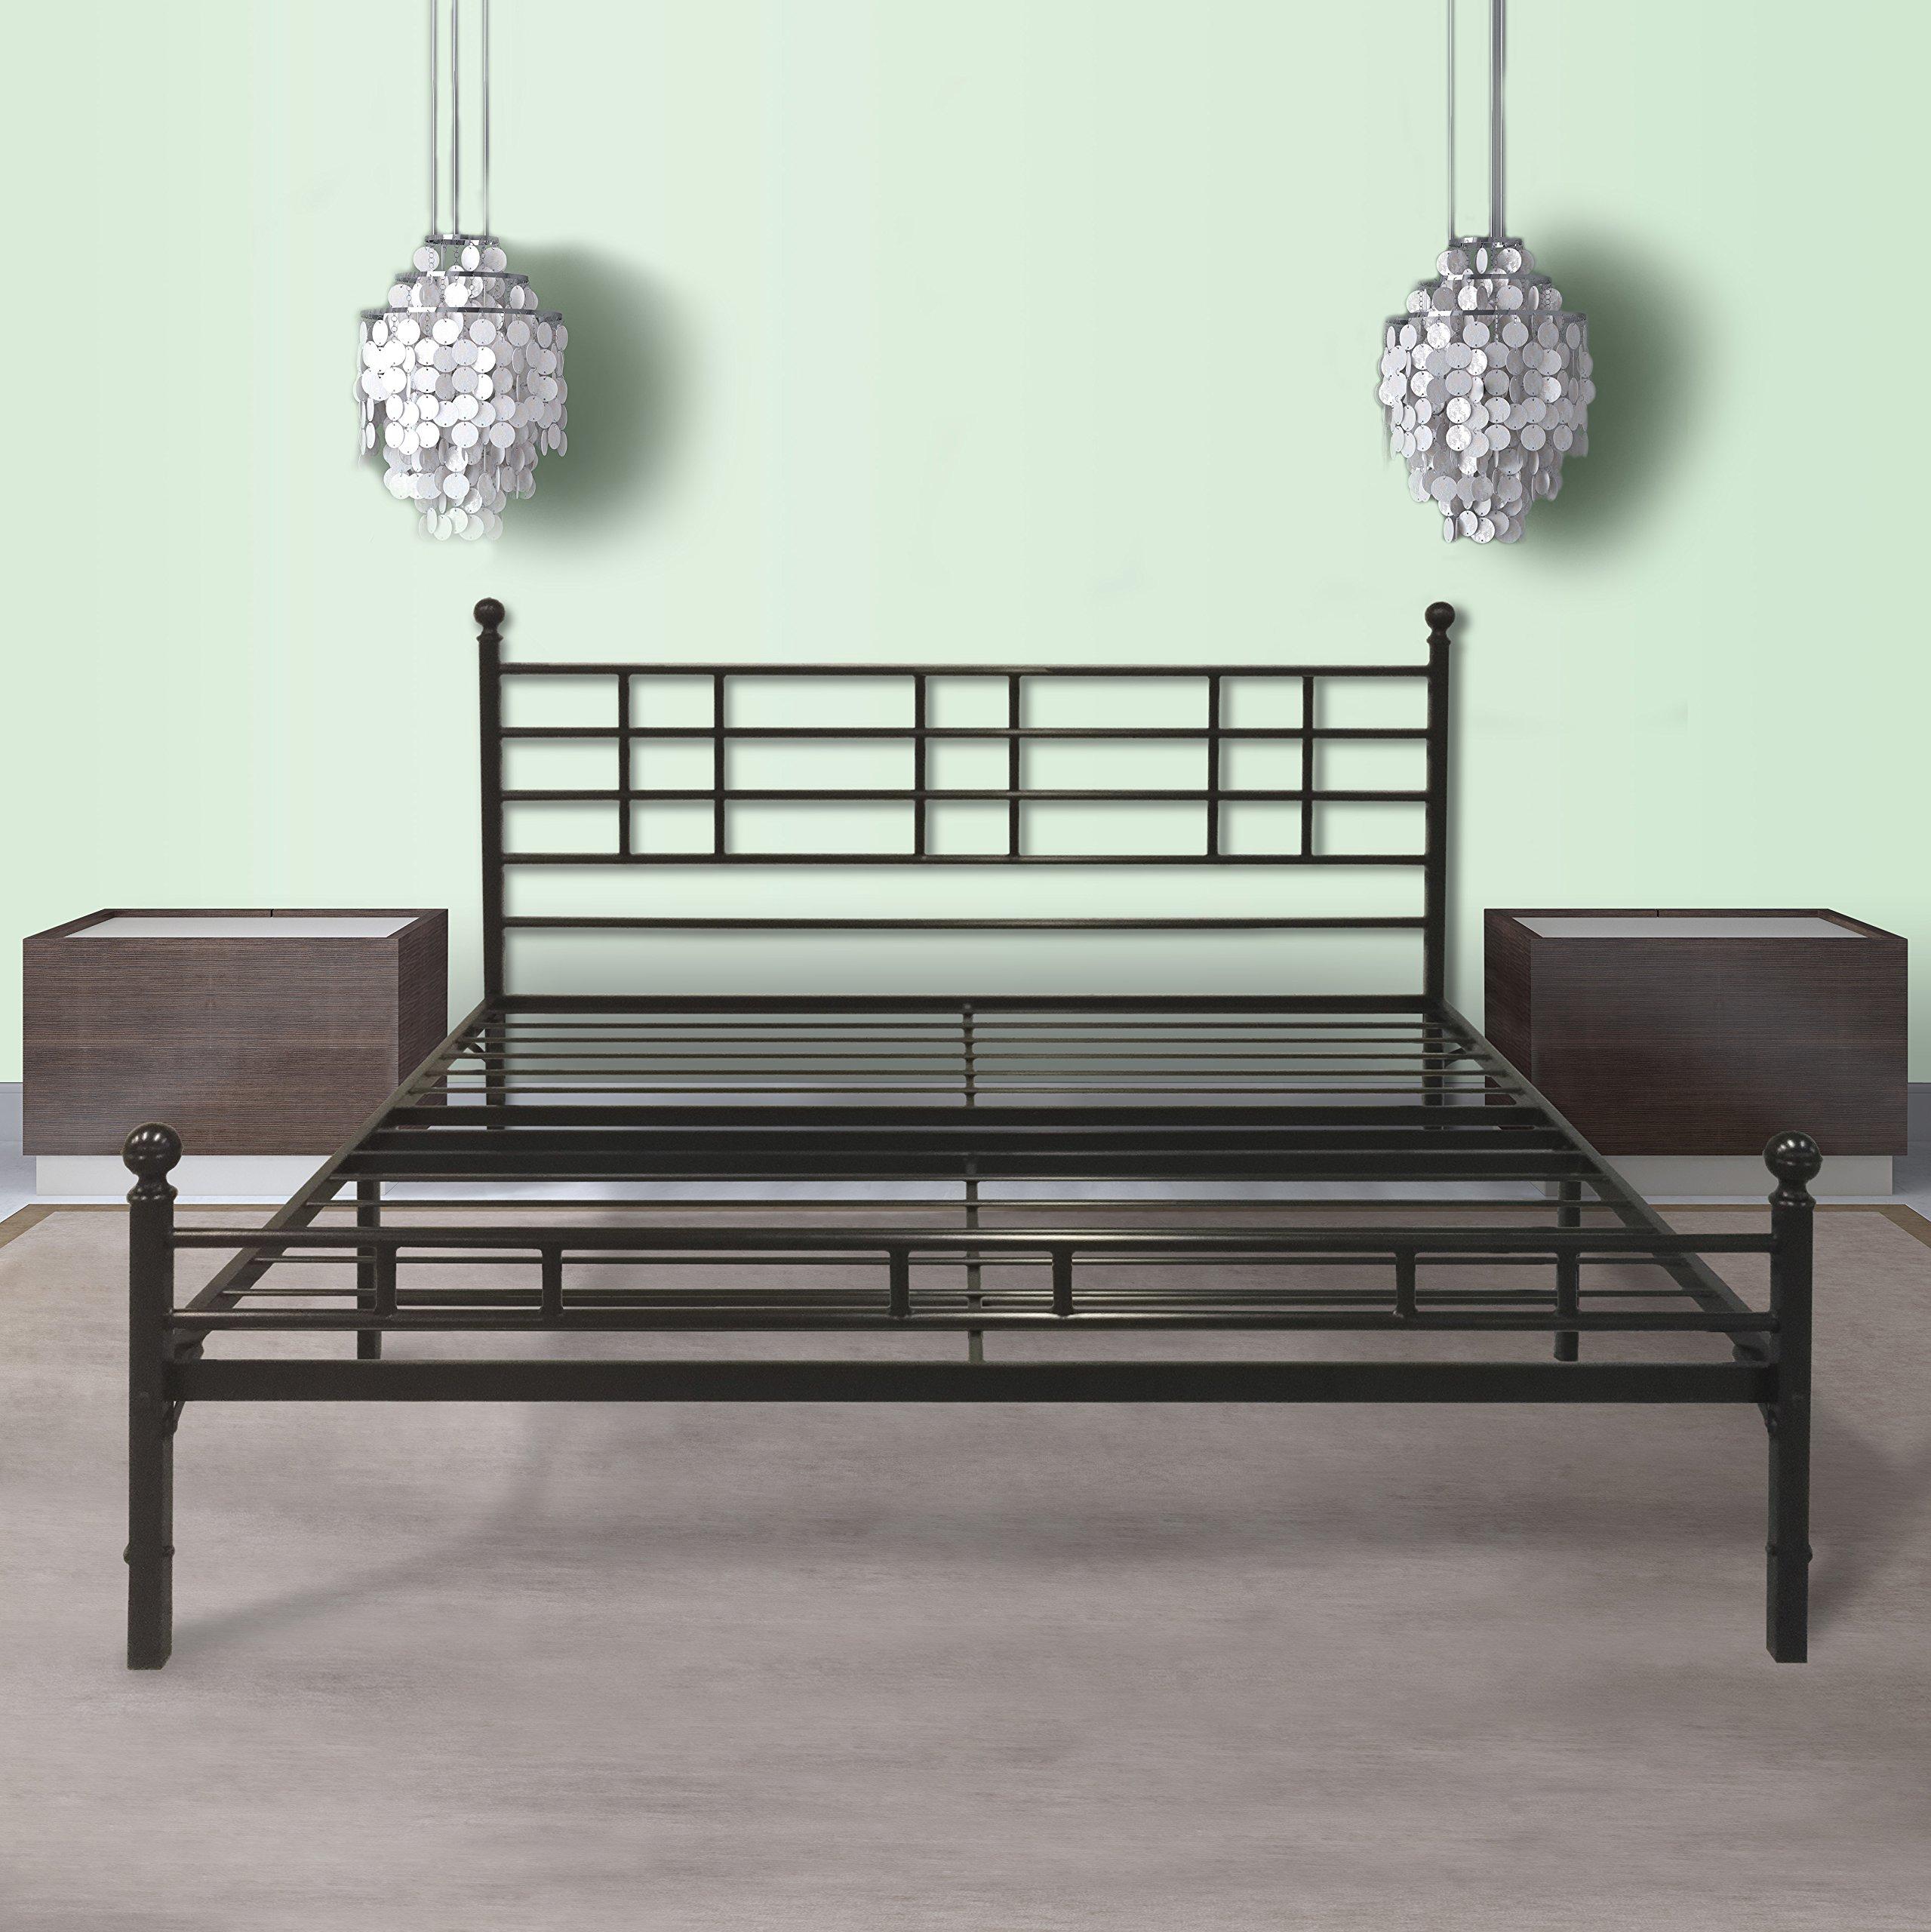 Best Price Mattress Model H Easy Set-Up Steel Platform Bed/Steel Bed Frame, Queen, Black